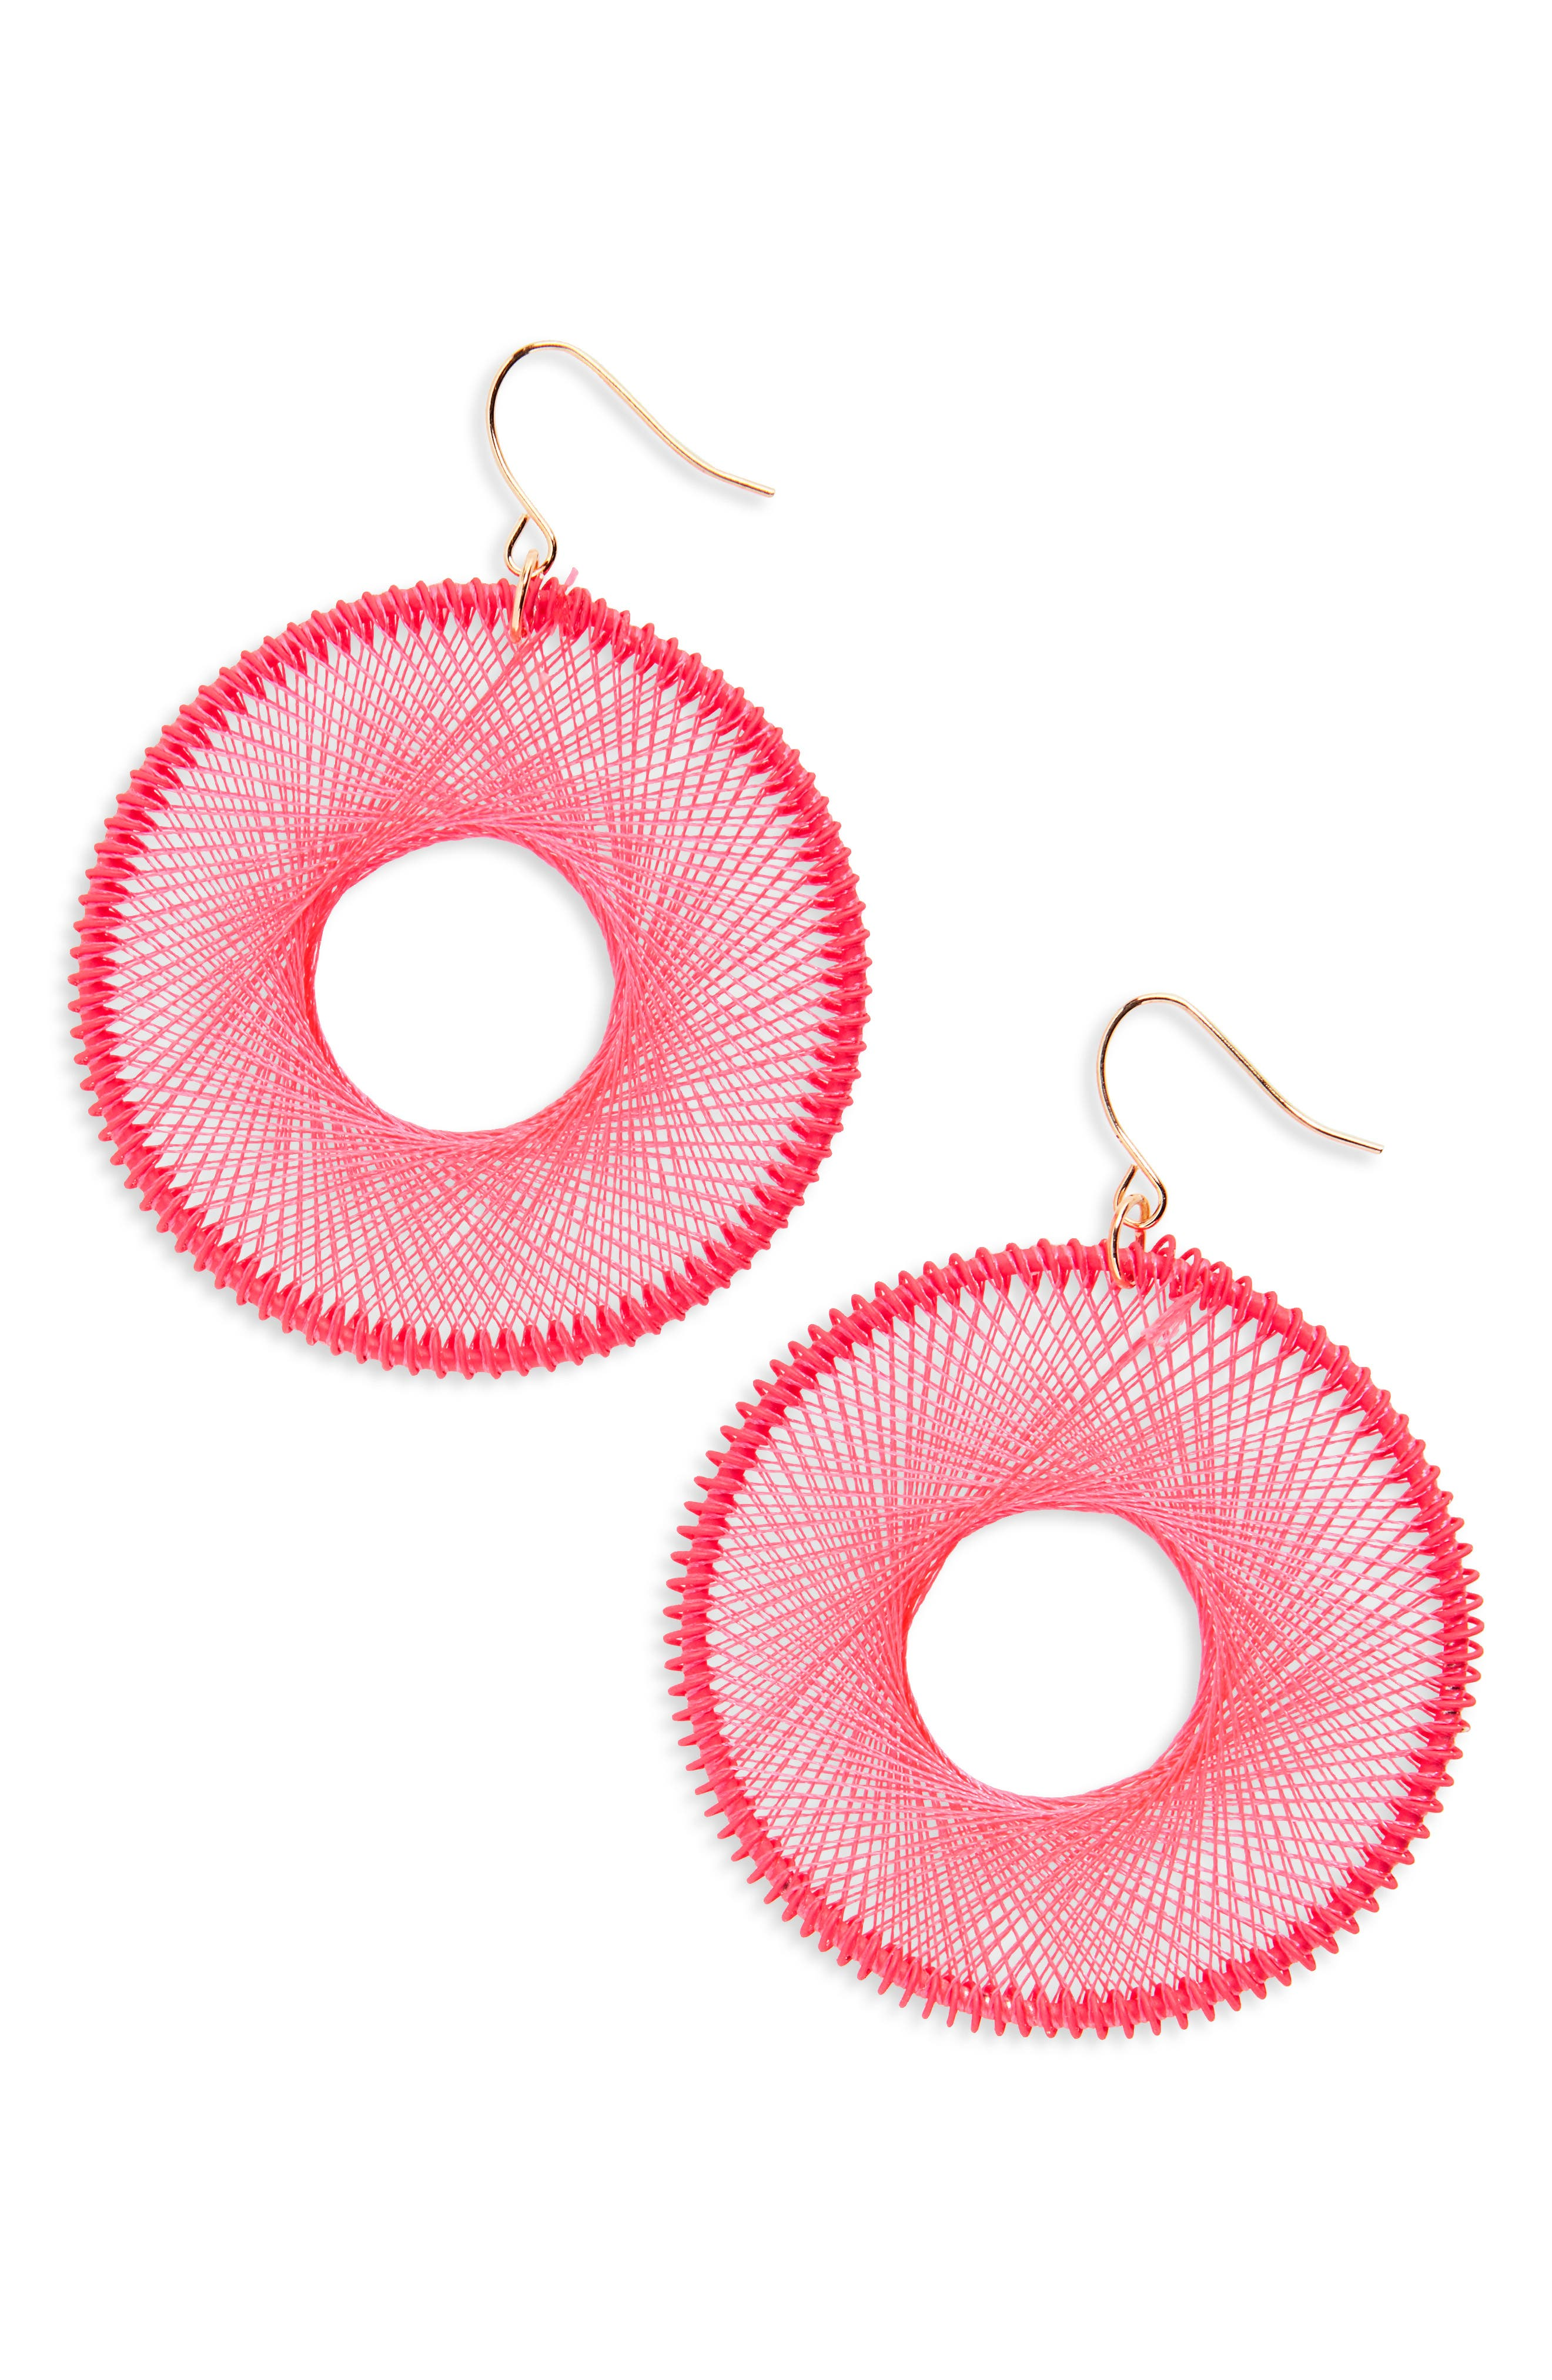 Silk Thread Hoop Earrings,                             Main thumbnail 1, color,                             Hot Pink